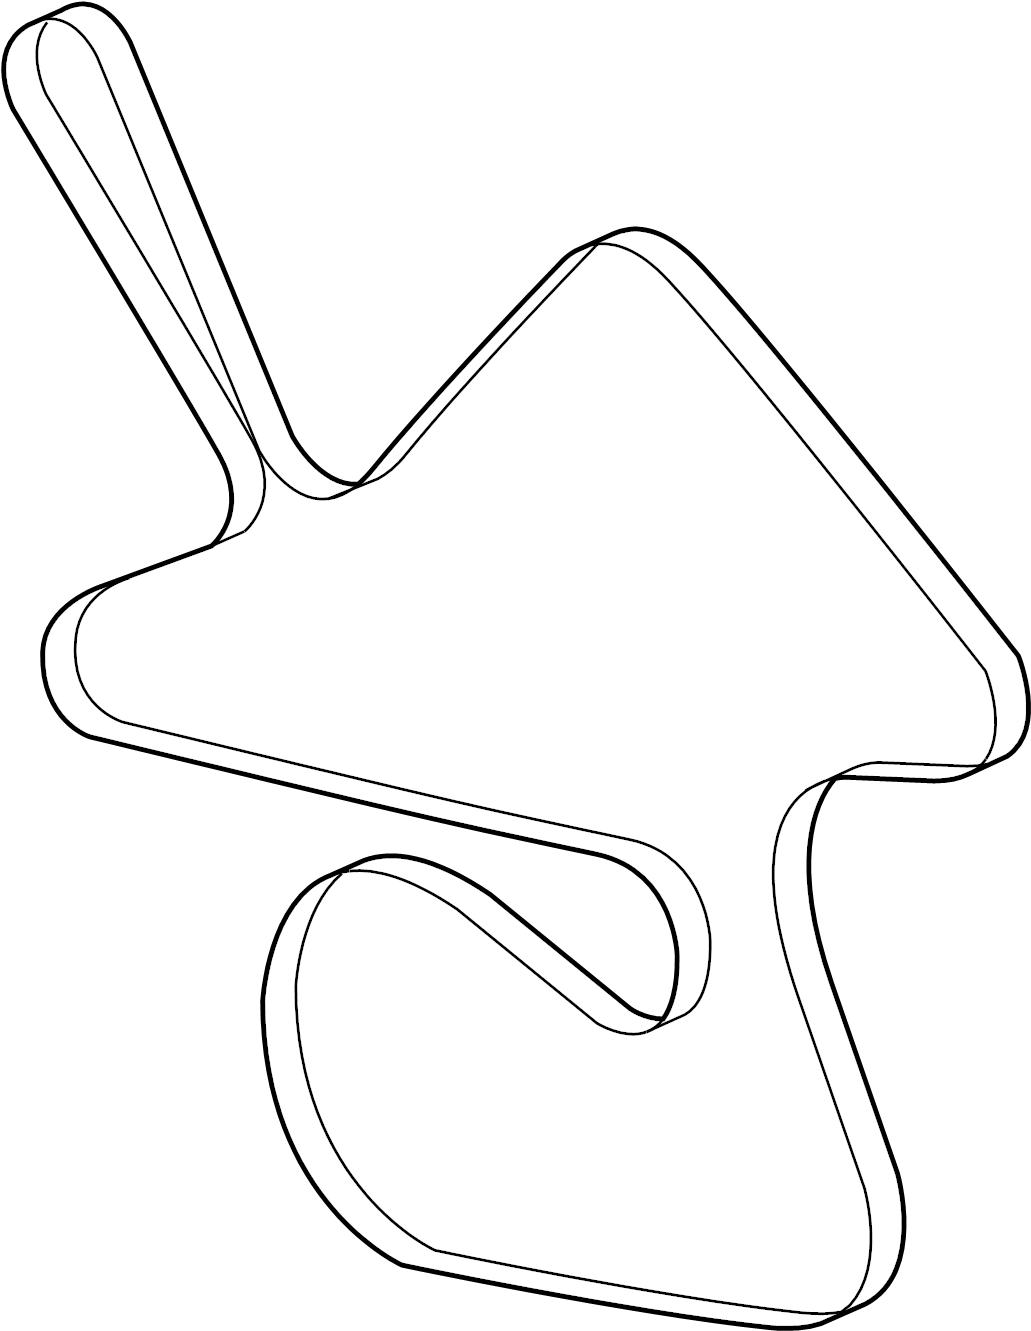 Chevrolet Monte Carlo Serpentine Belt Belts Drive